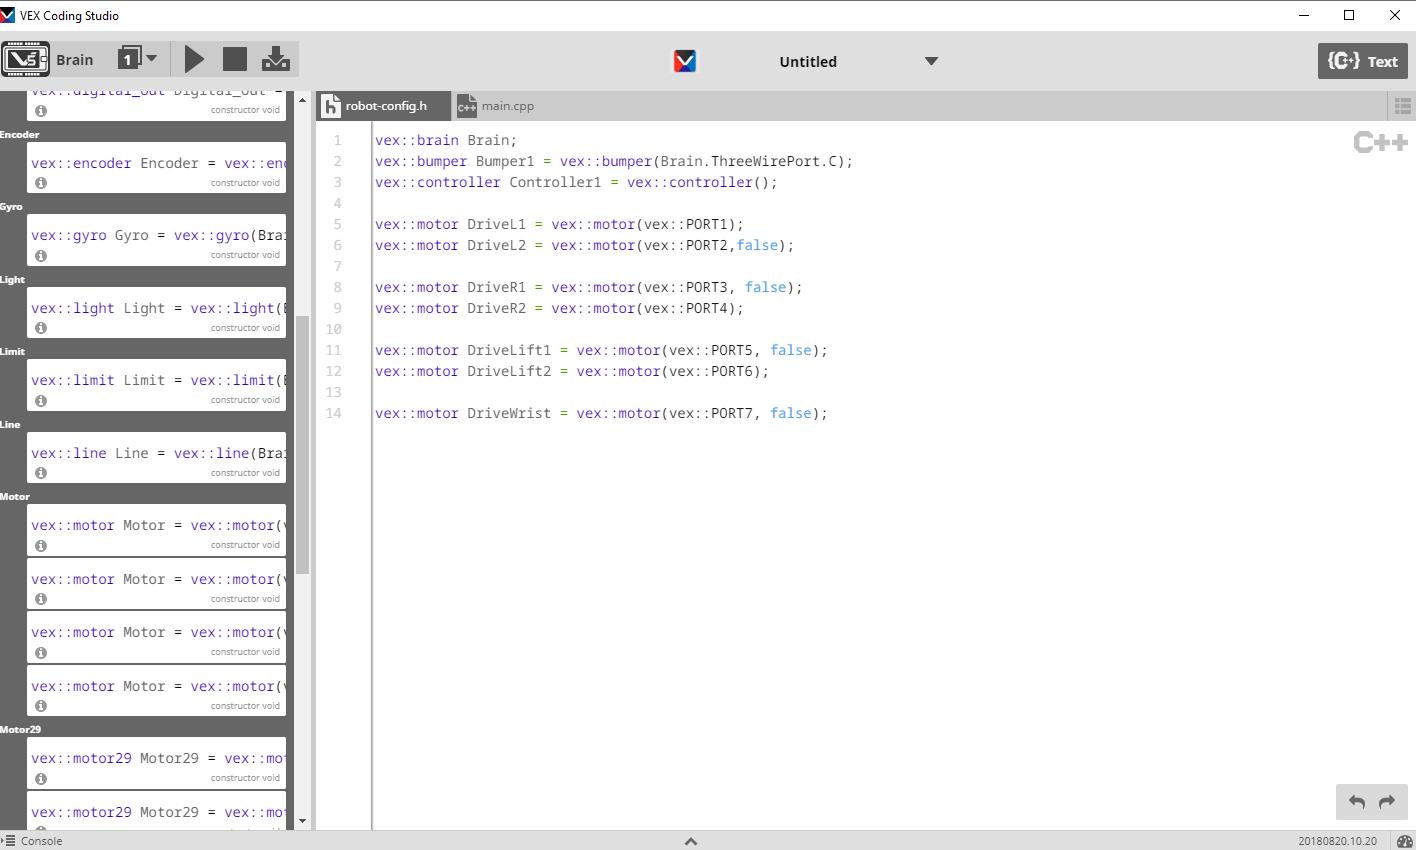 Programming Software Comparison - 7842 Navigators